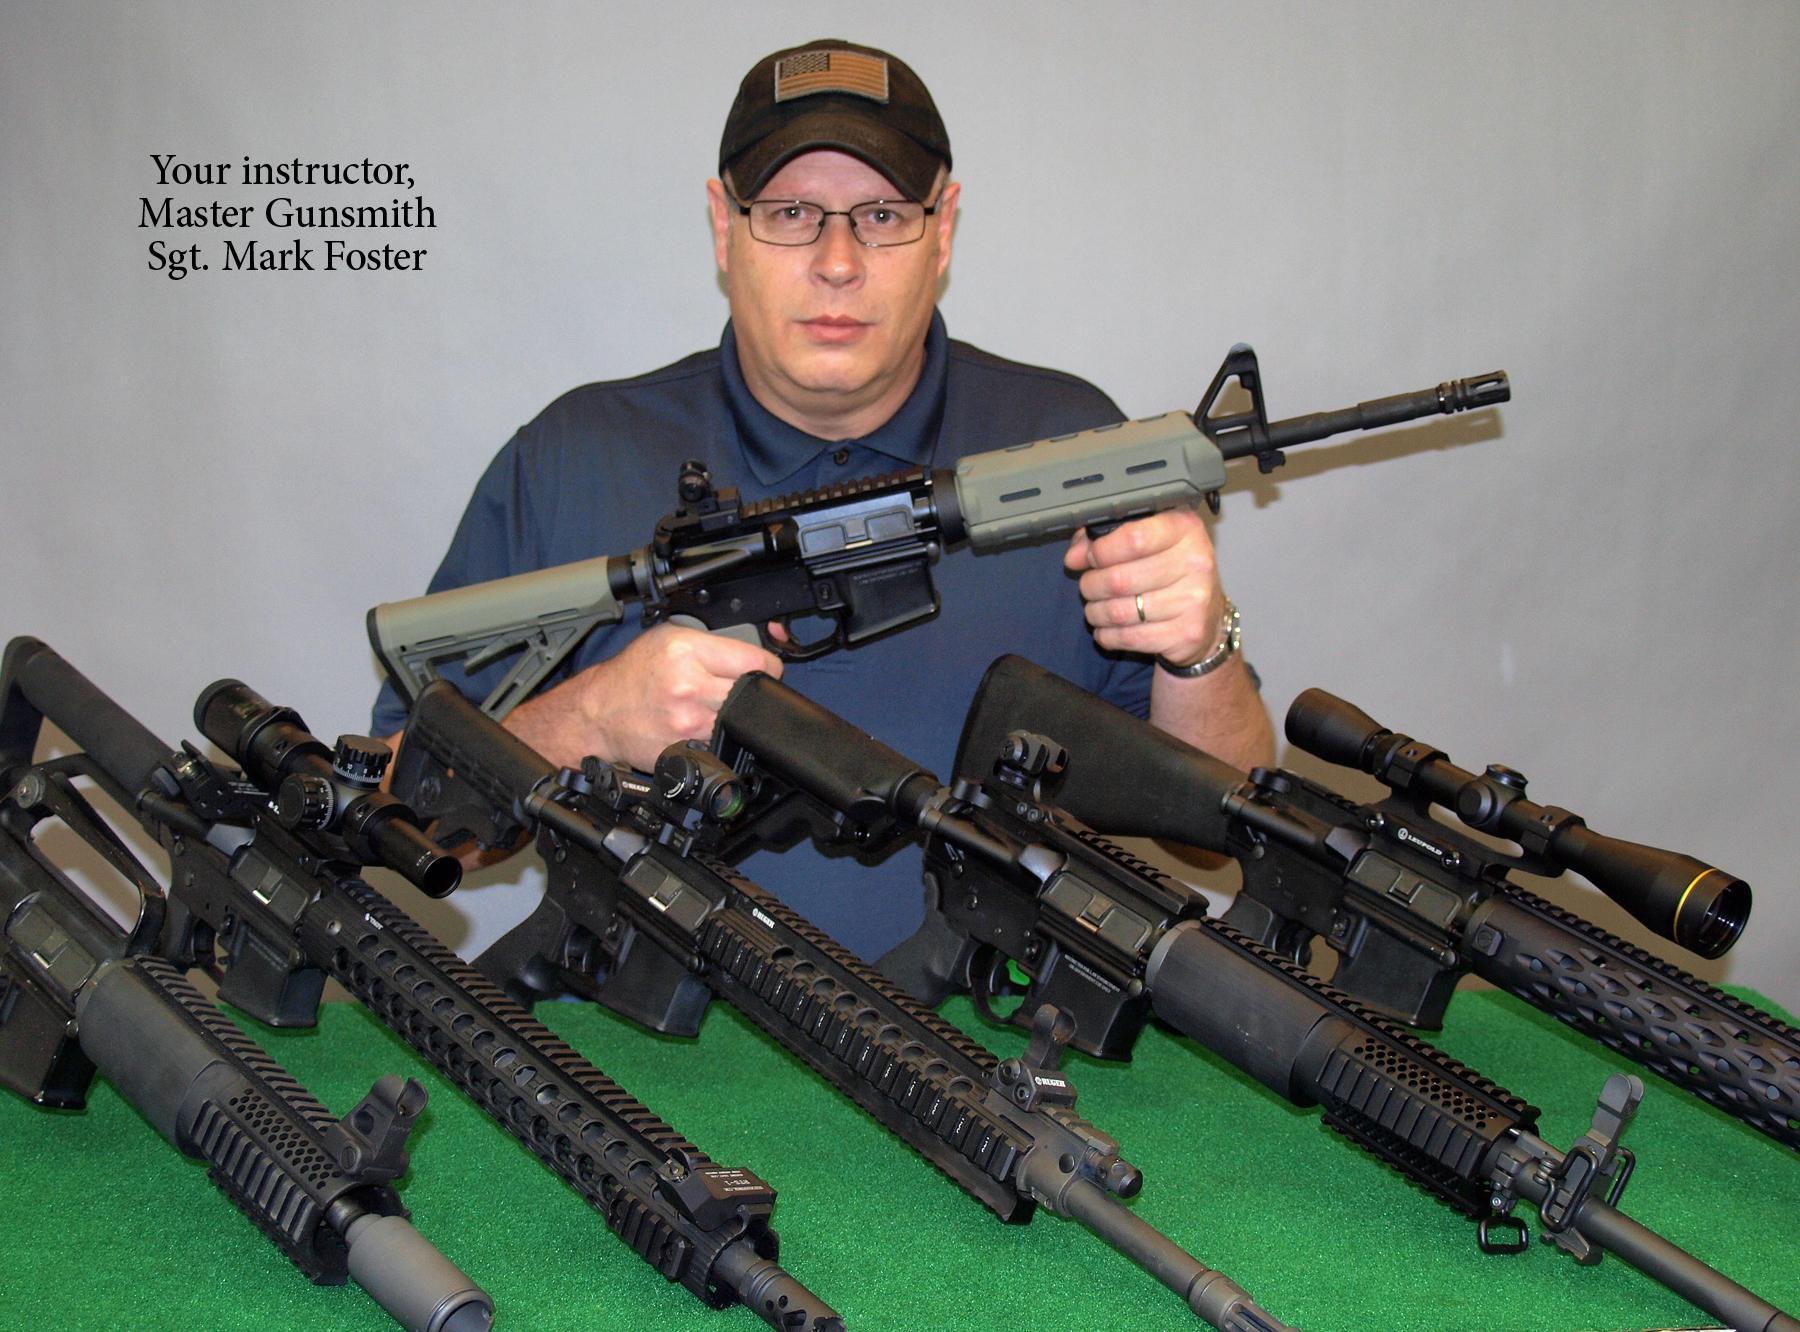 Tacti-Cool AR-15 Mods - Tips from a Master Gunsmith